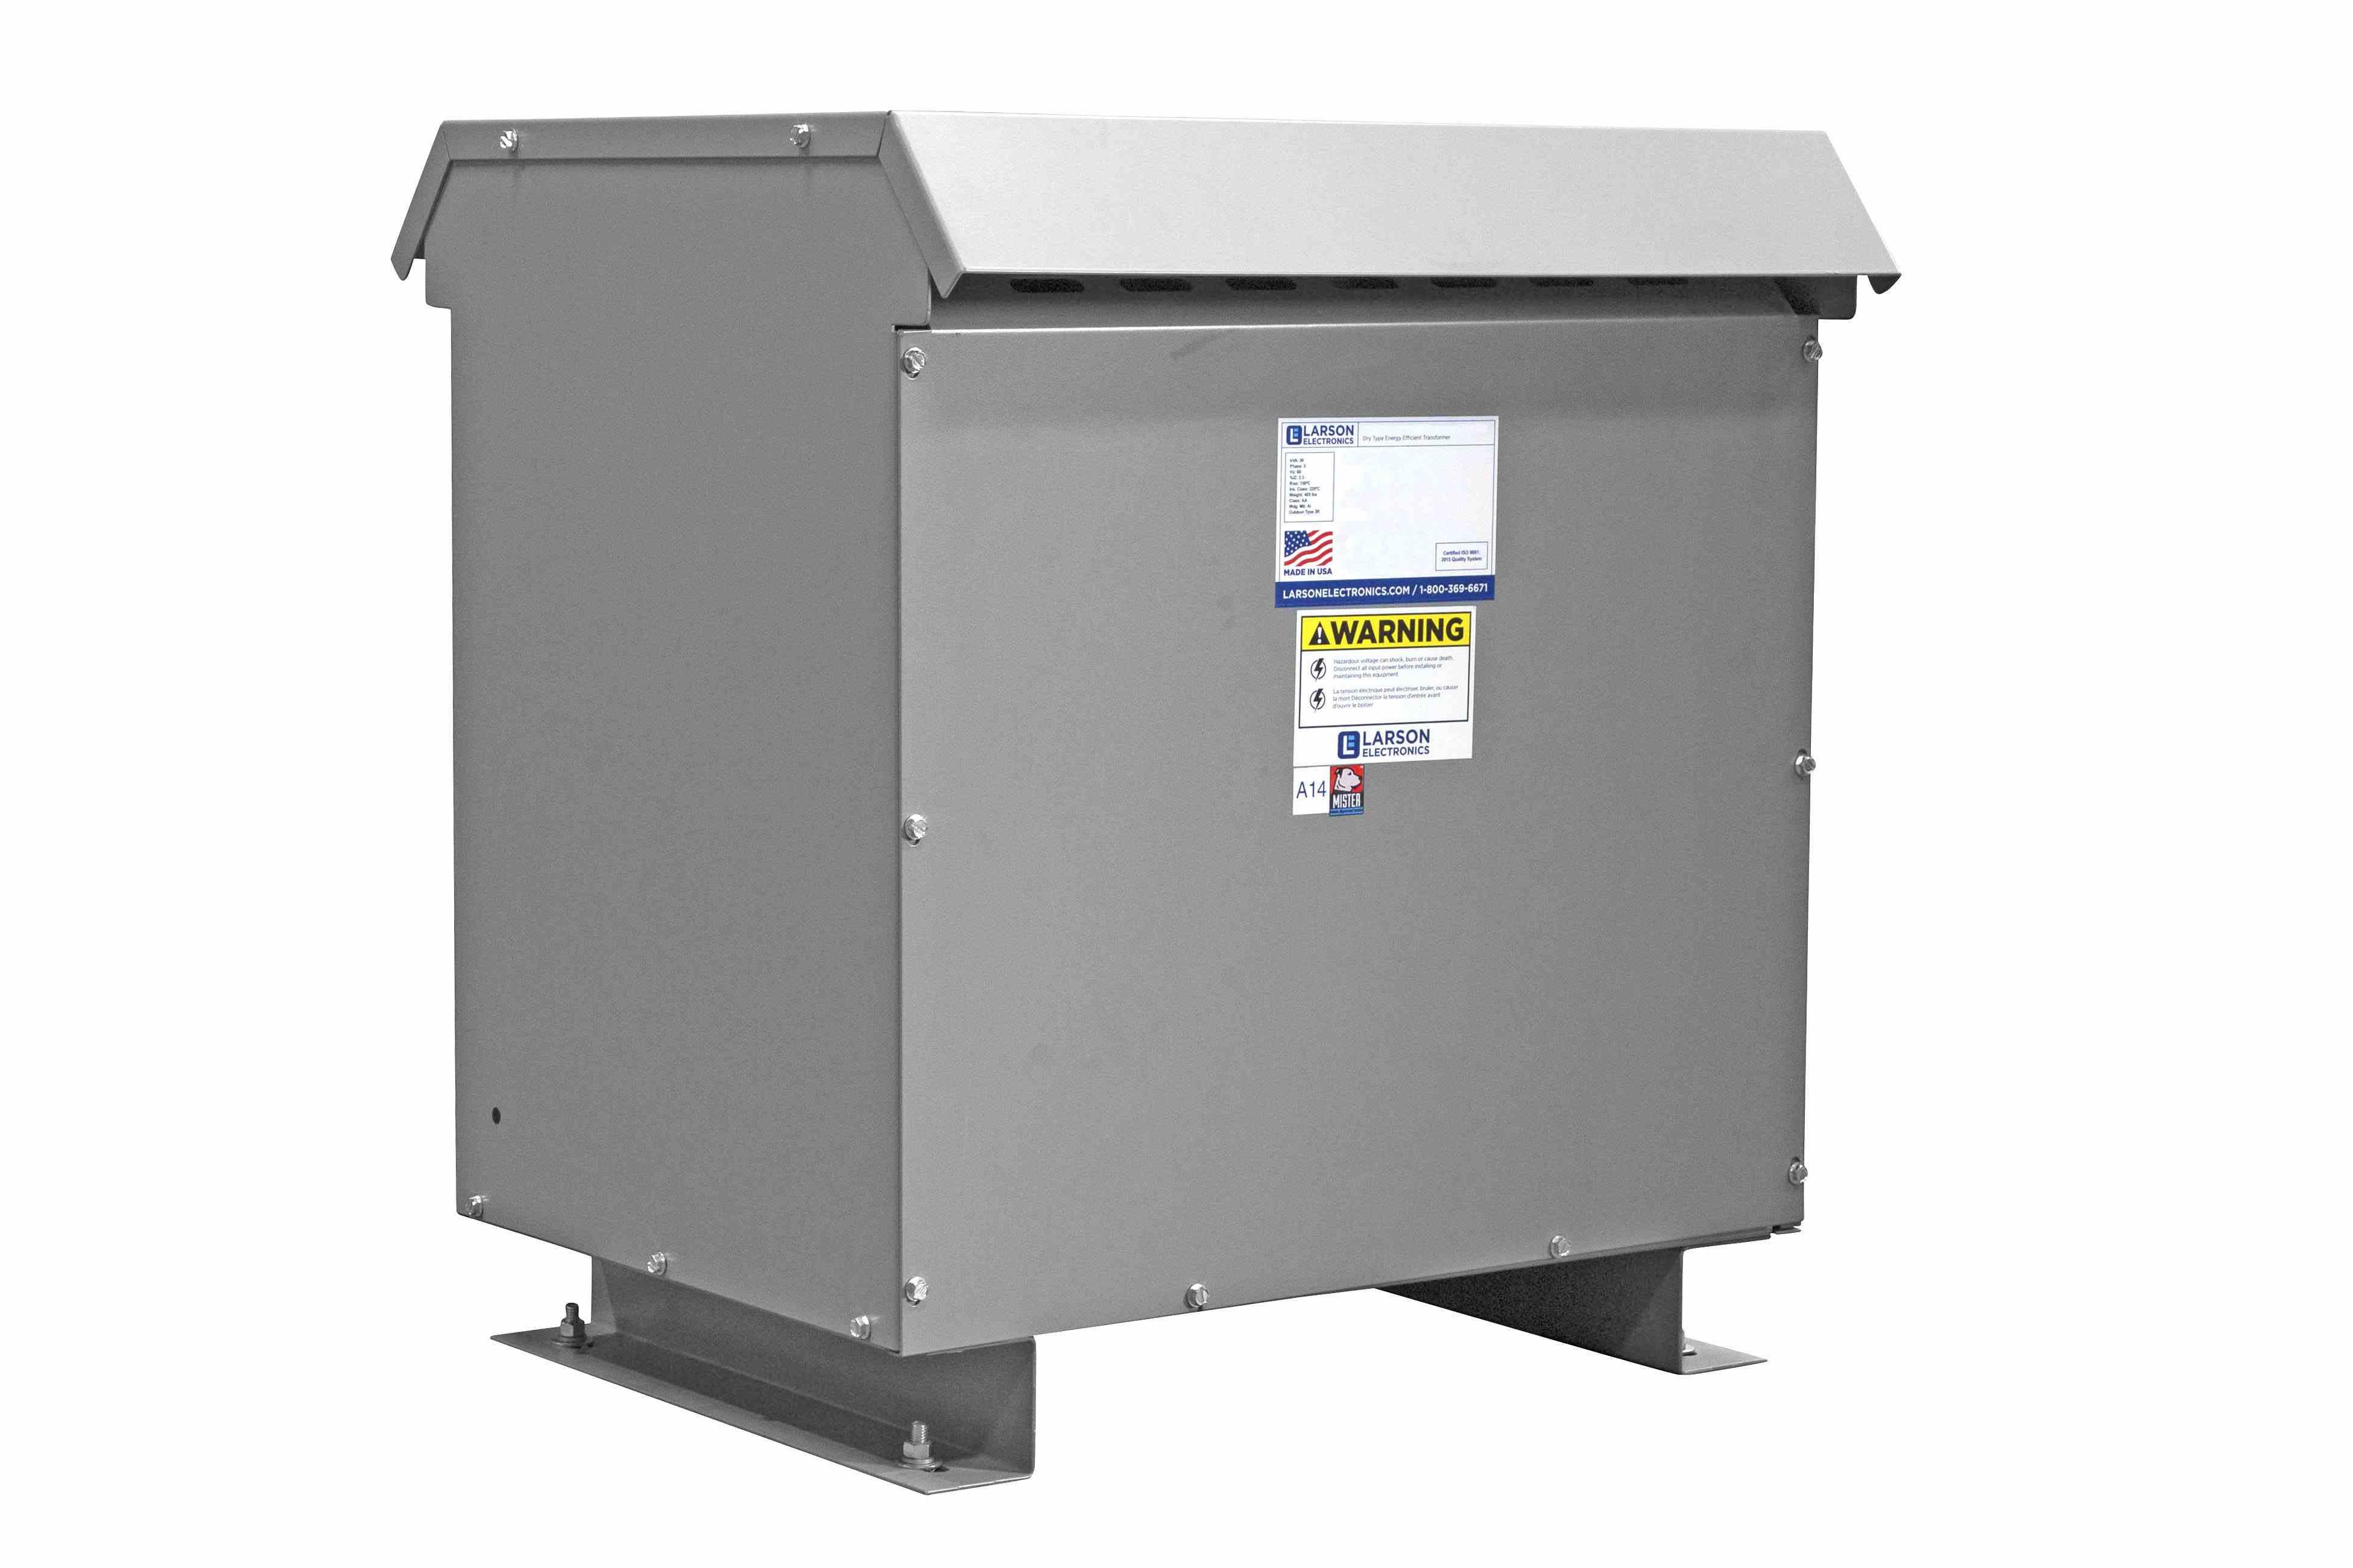 75 kVA 3PH Isolation Transformer, 240V Wye Primary, 480V Delta Secondary, N3R, Ventilated, 60 Hz